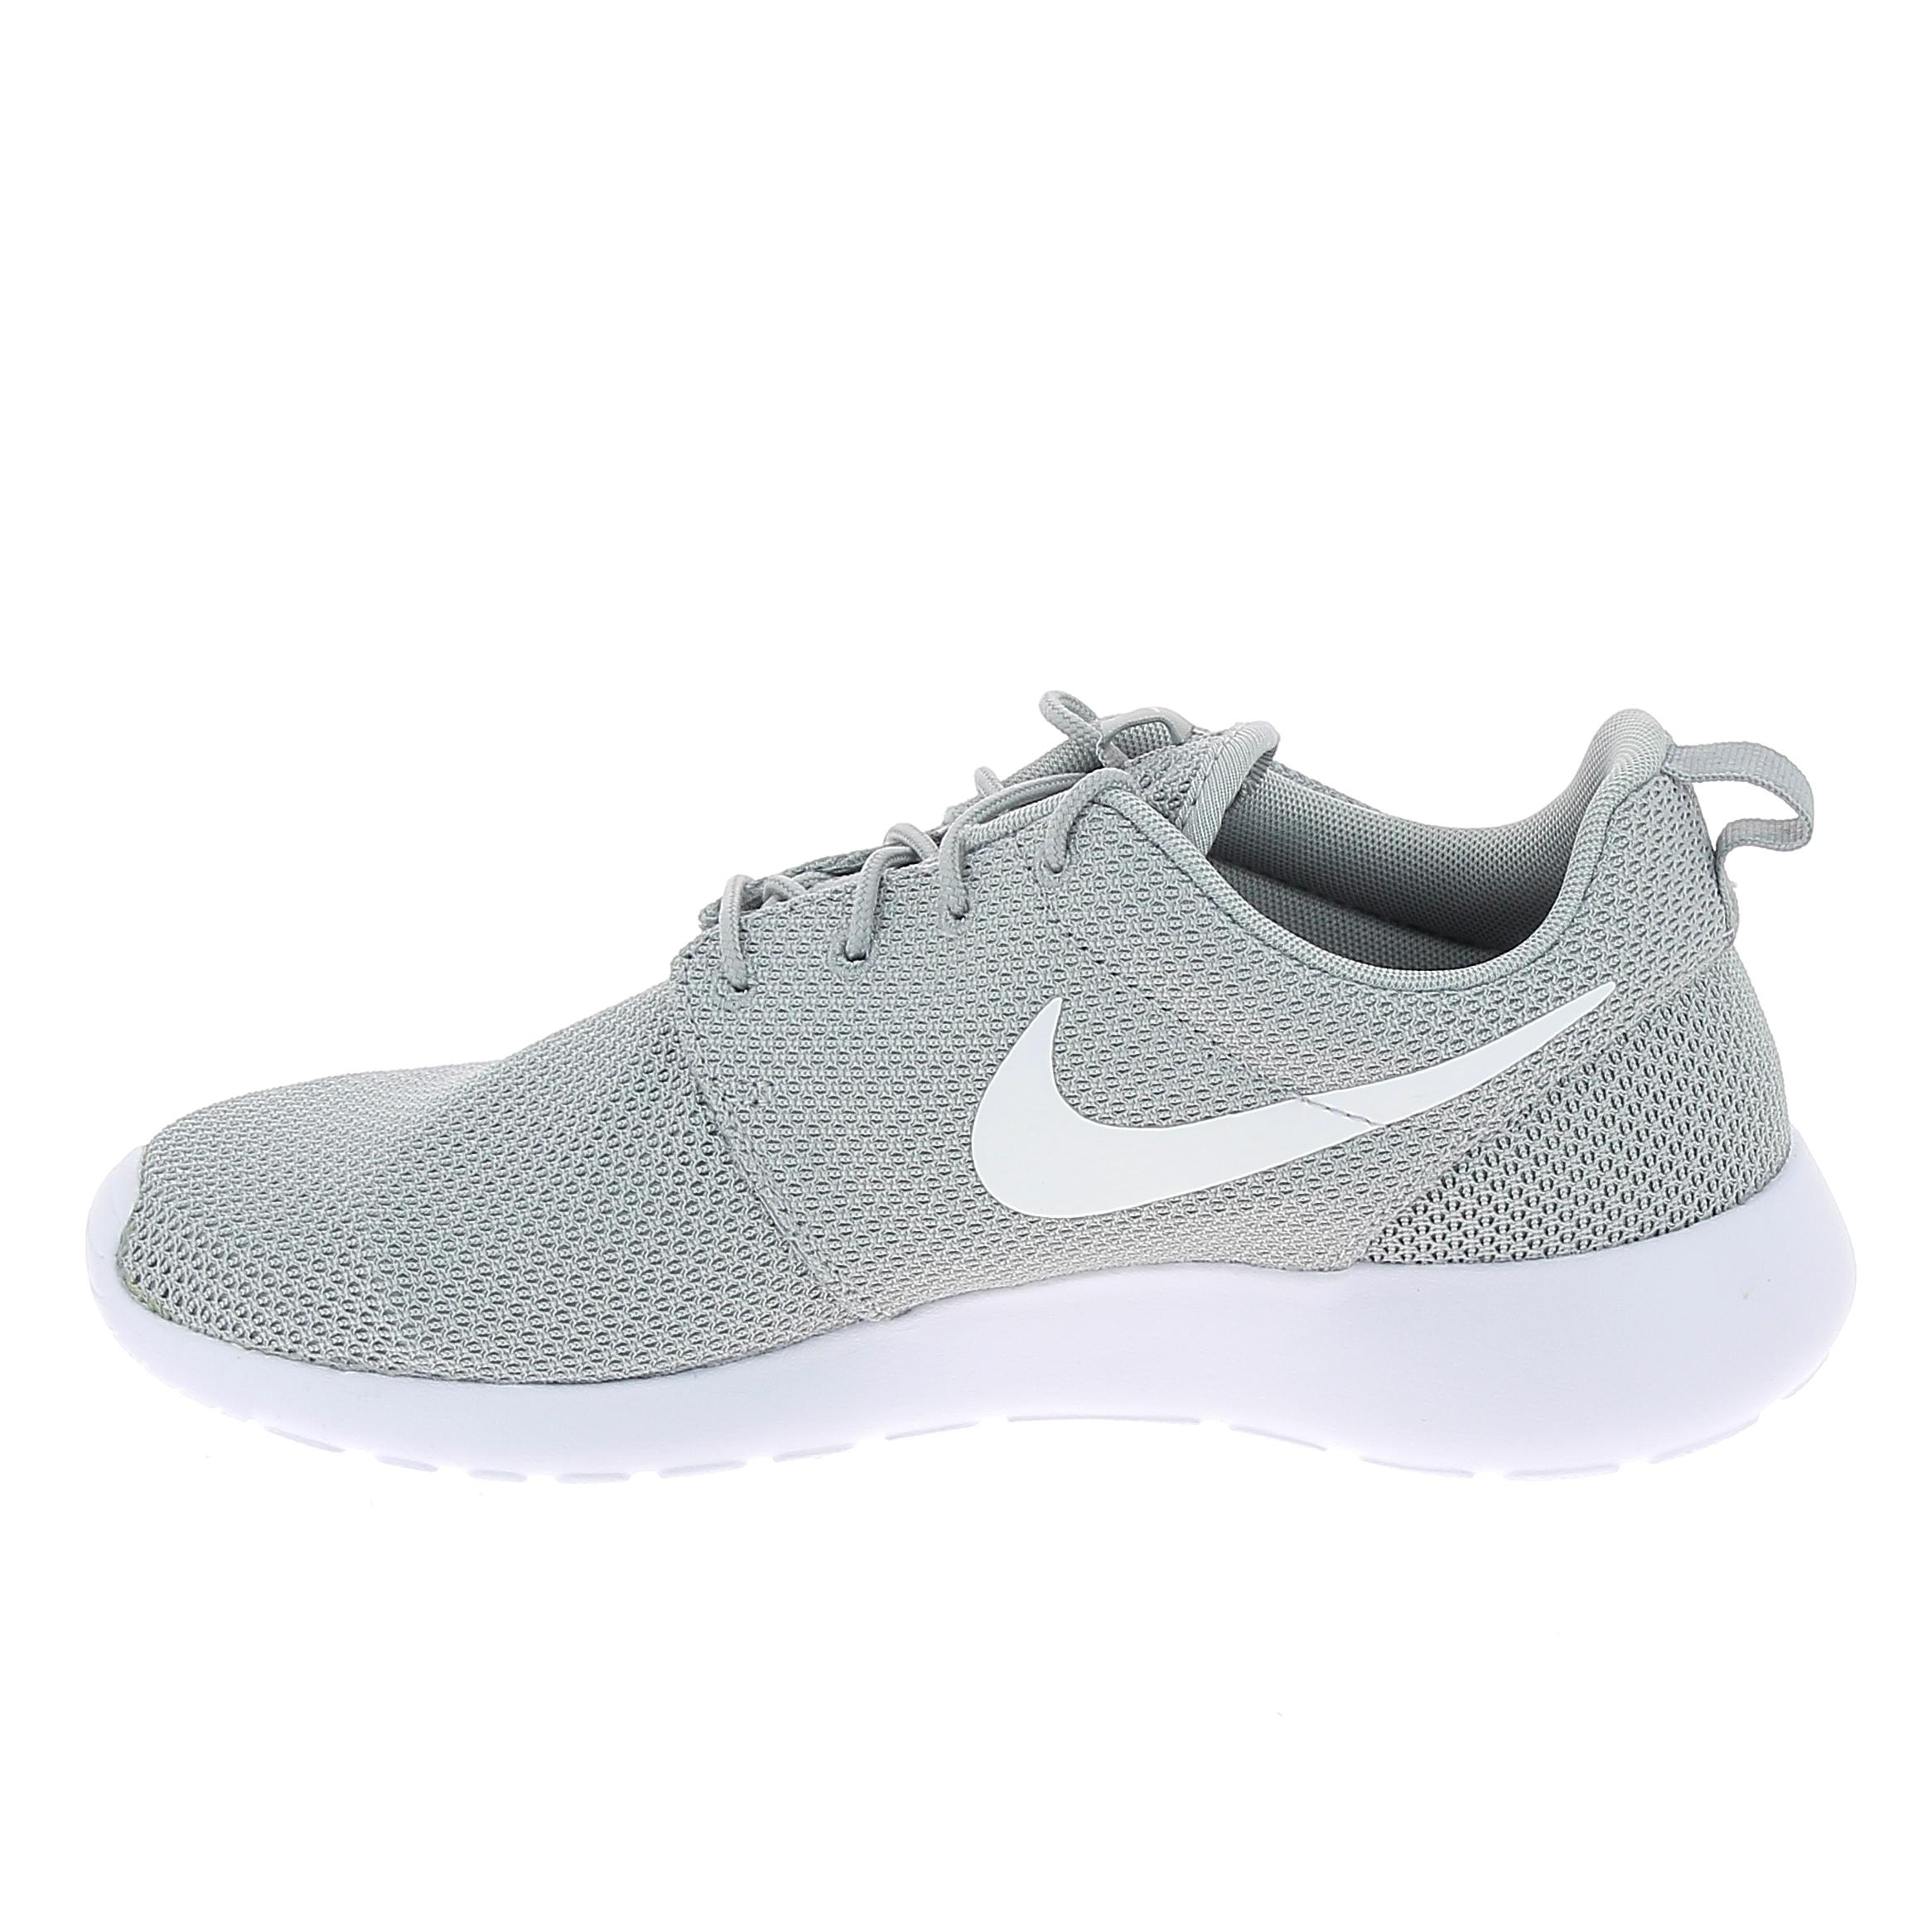 la meilleure attitude 57628 7bd6c Basket mode, SneakerBasket mode - Sneakers NIKE Roshe One Gris Blanc